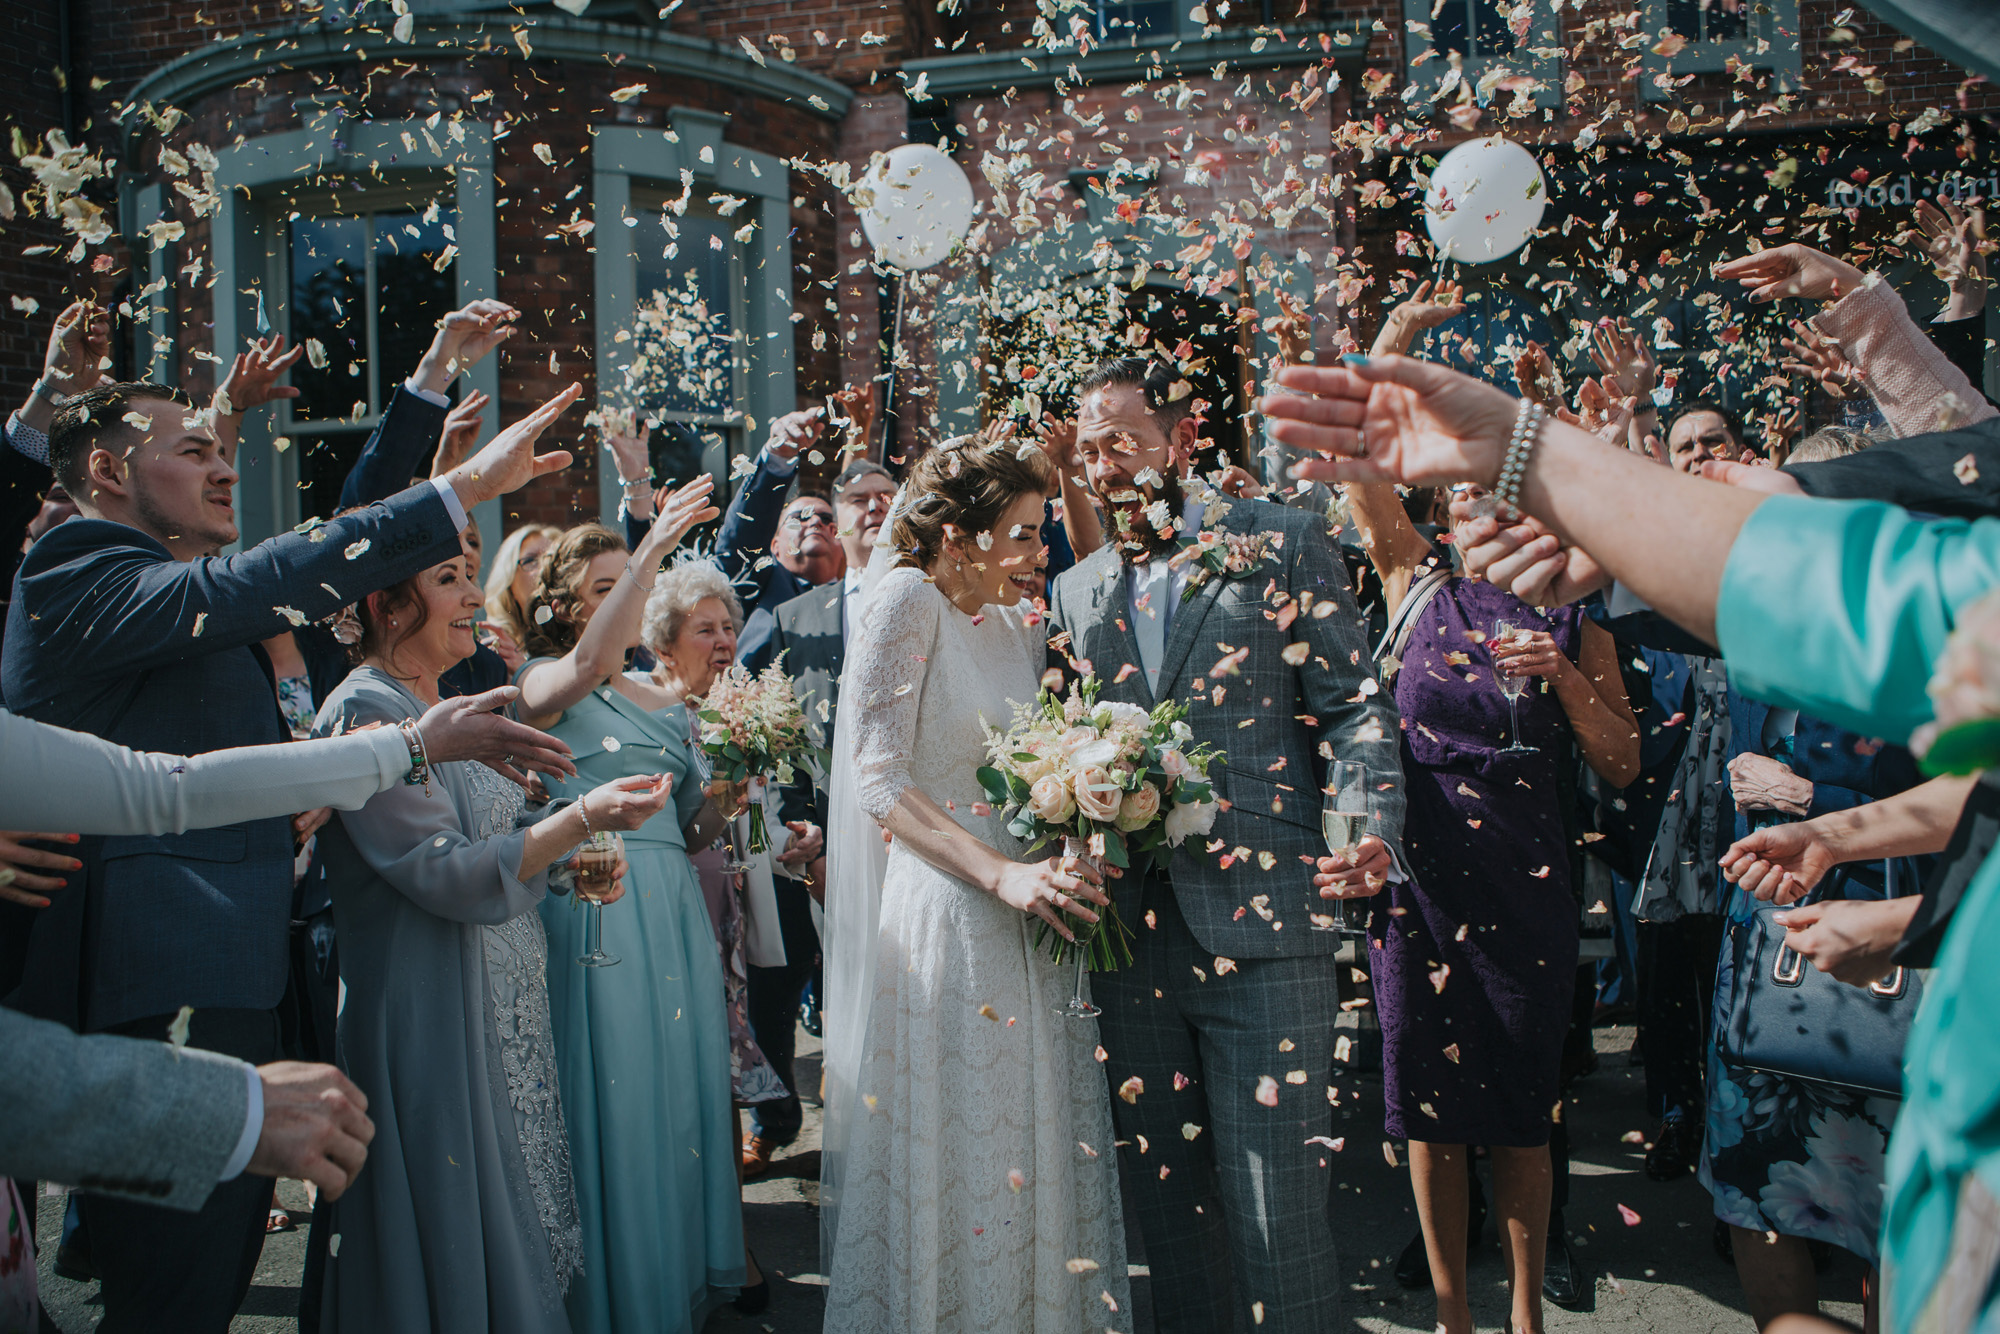 Kate-Beaumont-Lace-Flared-Dahlia-Gown-Leeds-Wedding-Bloom-Weddings-28.jpg